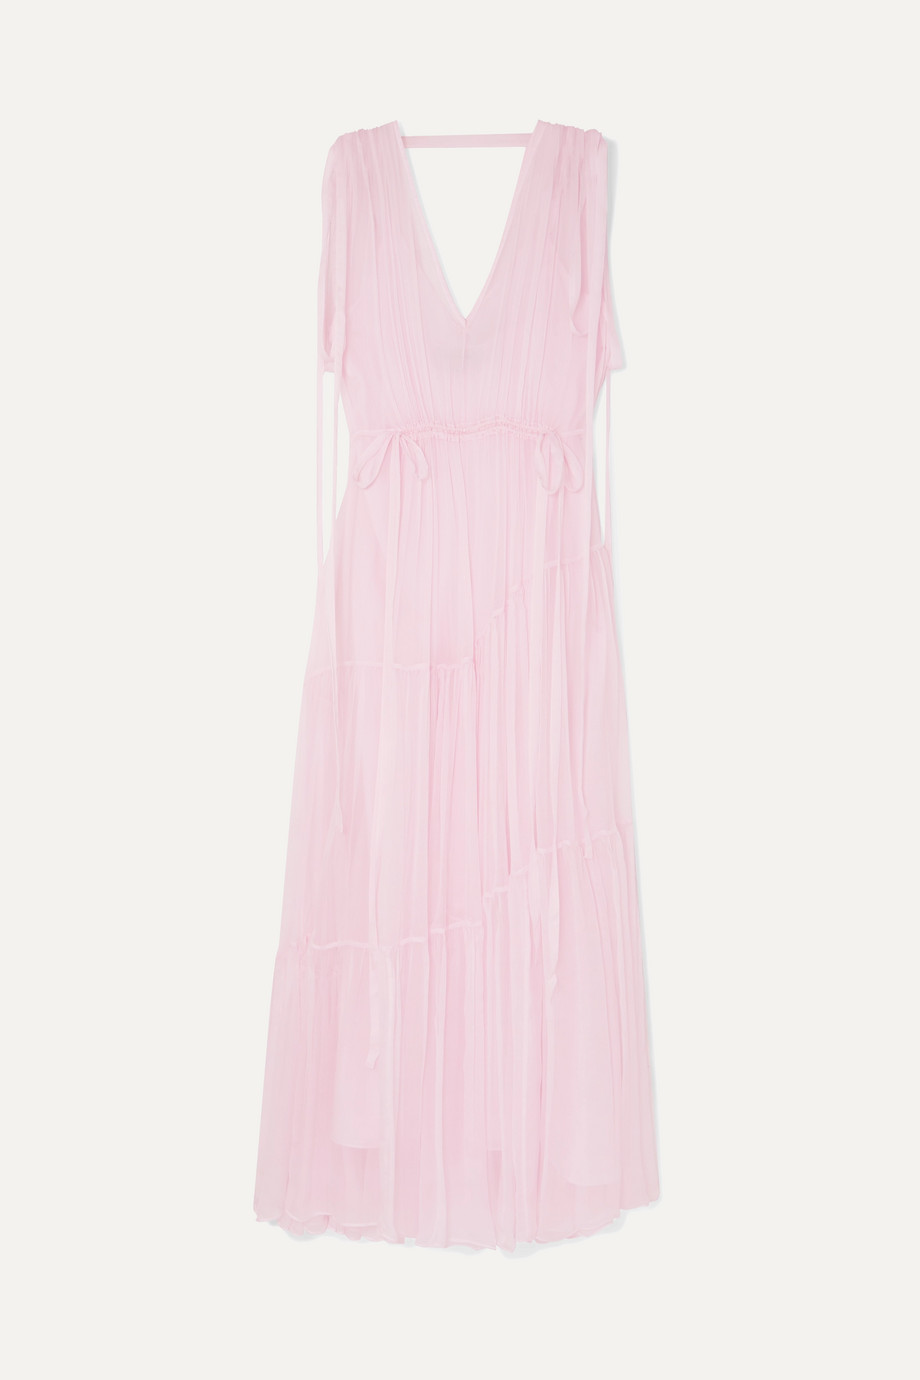 Lee Mathews   Petra ruched tiered silk-georgette maxi dress   NET-A-PORTER.COM